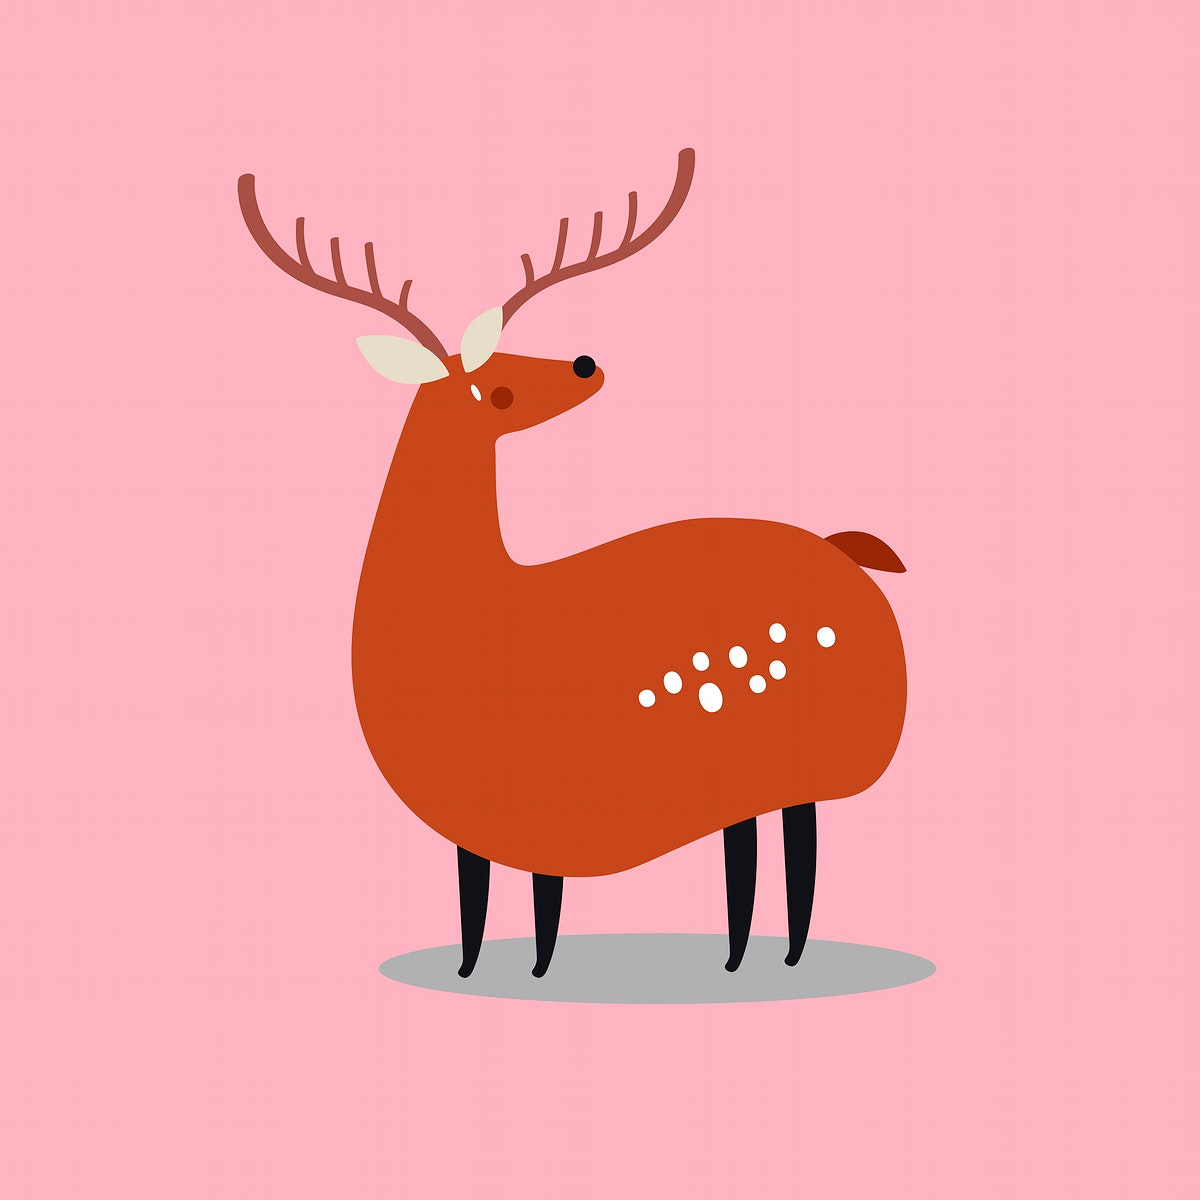 Brown deer animal psd cute wildlife cartoon sticker for kids